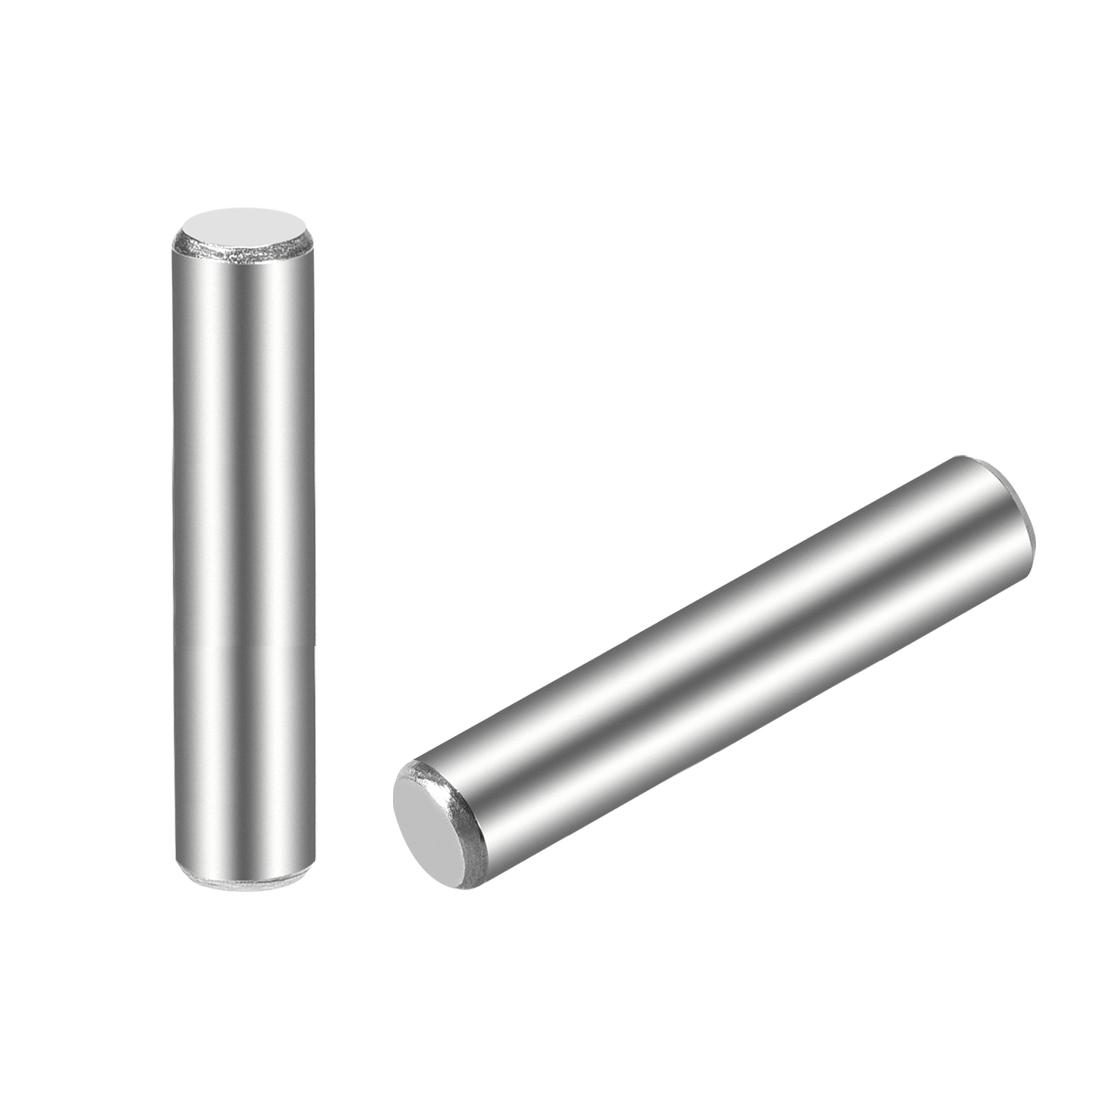 15Pcs 5mm x 30mm Dowel Pin 304 Stainless Steel Shelf Support Pin Fasten